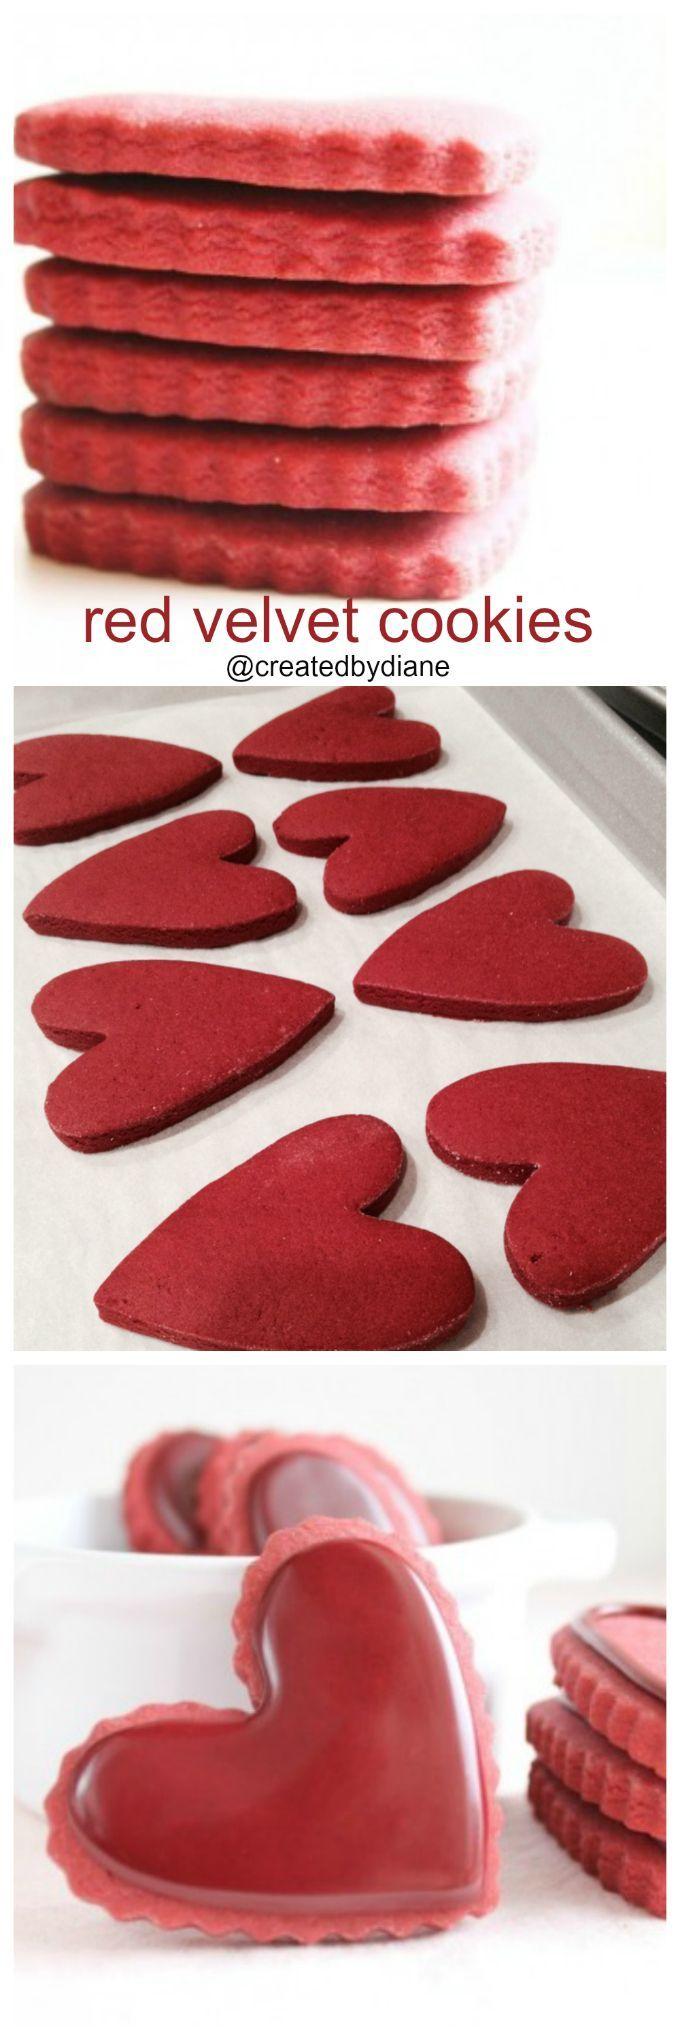 red-velvet-cookie-recipe